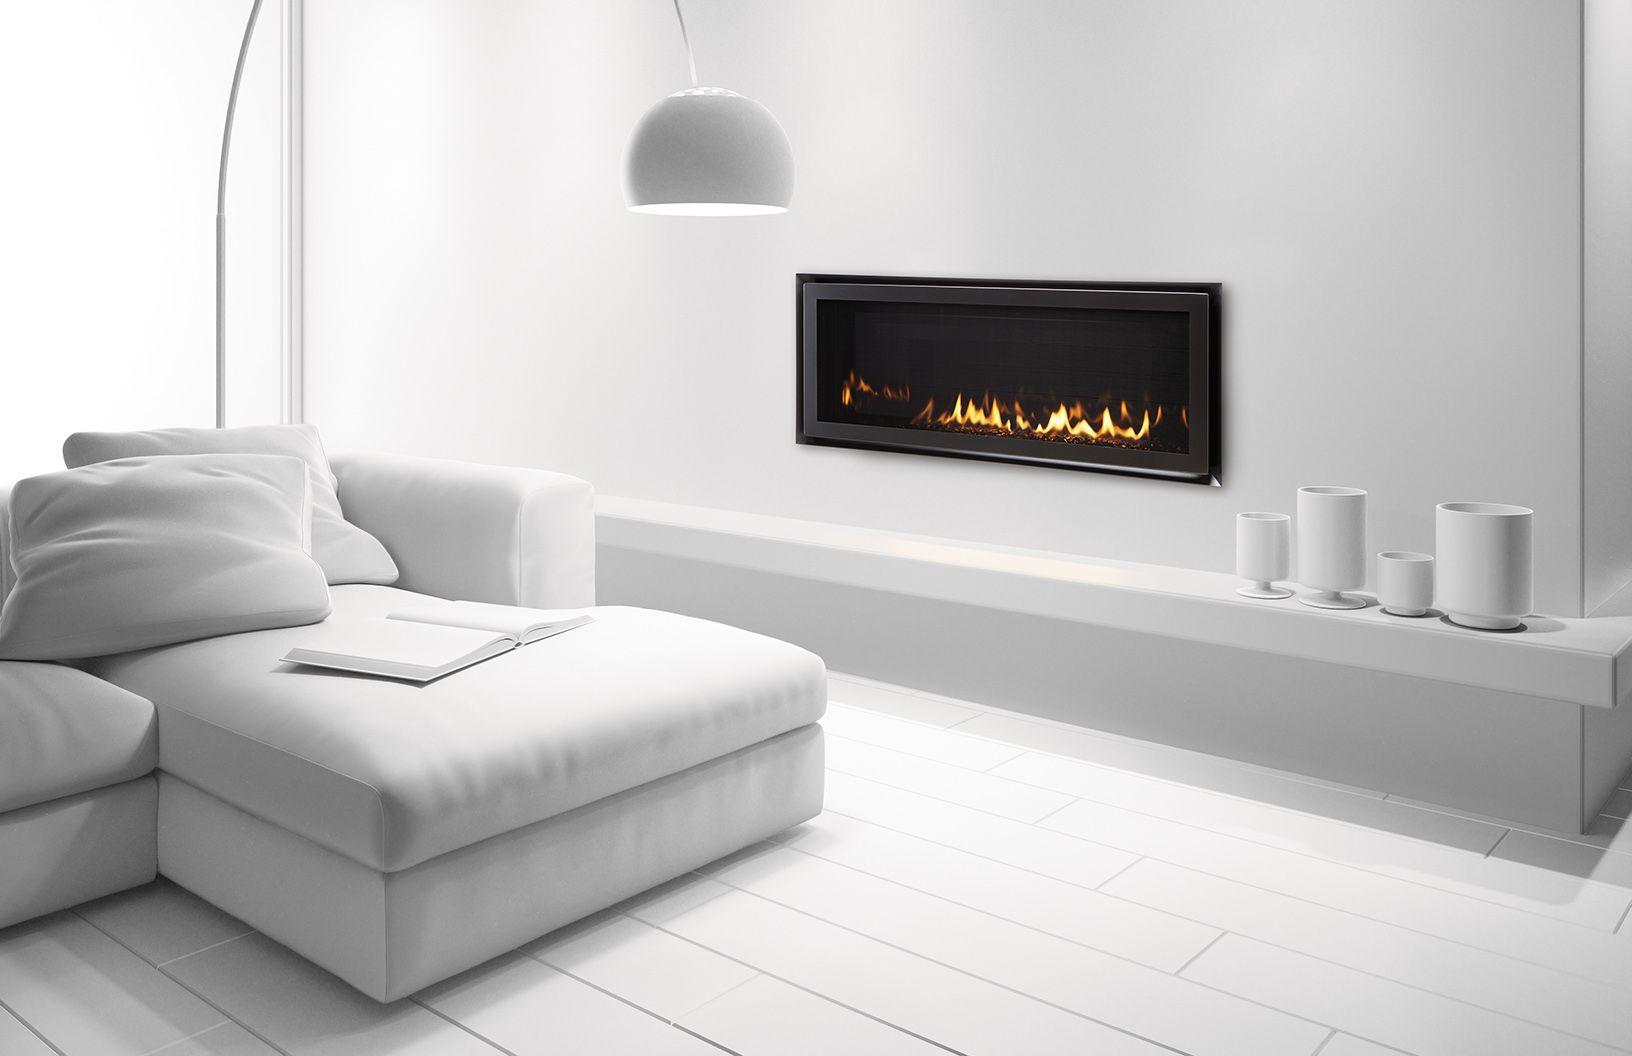 Heat Glo Slr C Cosmo 42 Gas Fireplace Fireplace Linear Fireplace